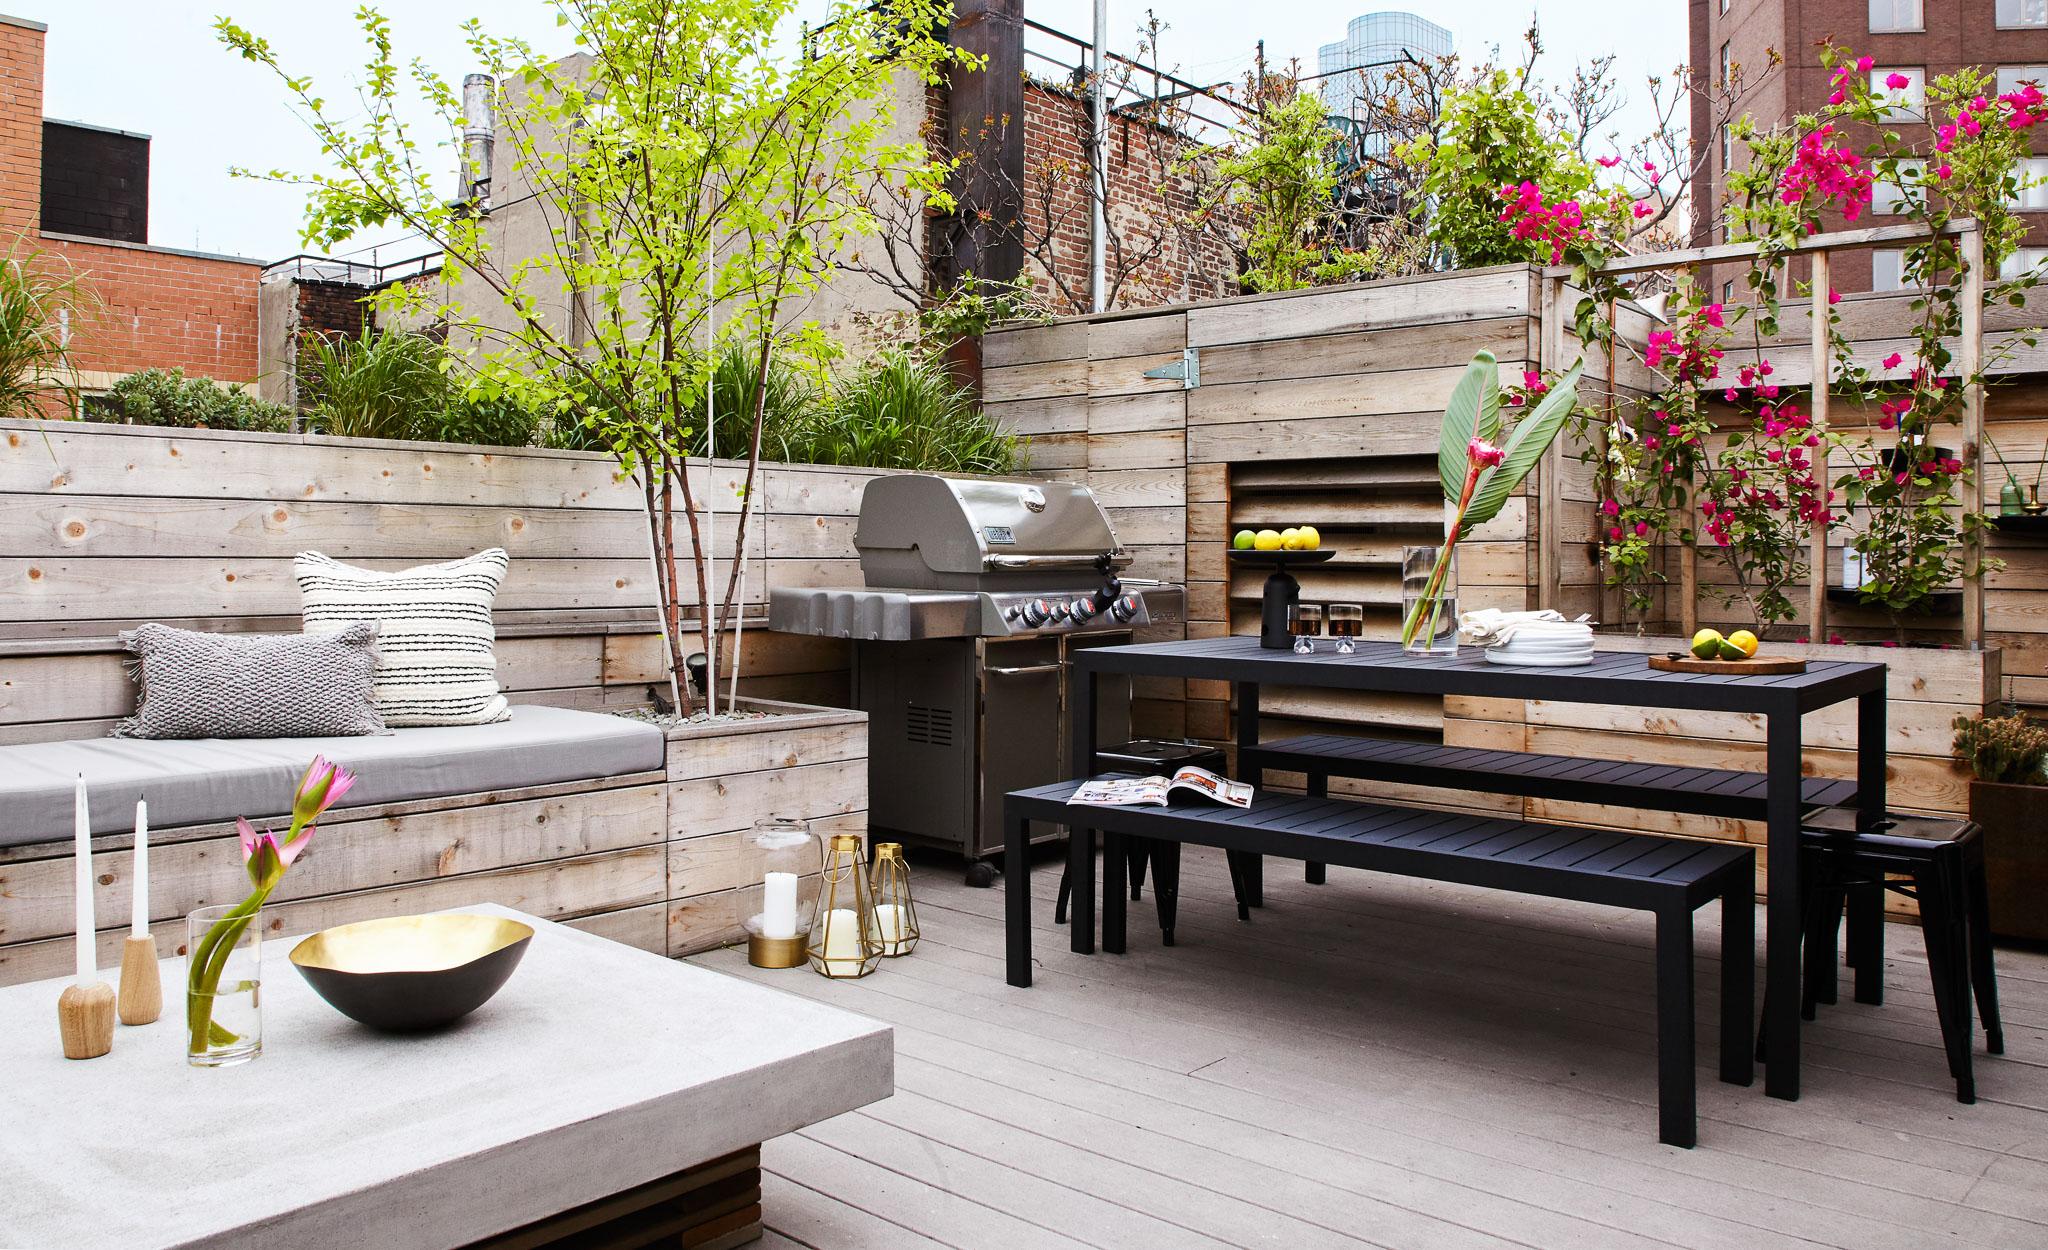 nyc interior design curbed ny inside heiress hannah bronfman s minimalist chic east village triplex